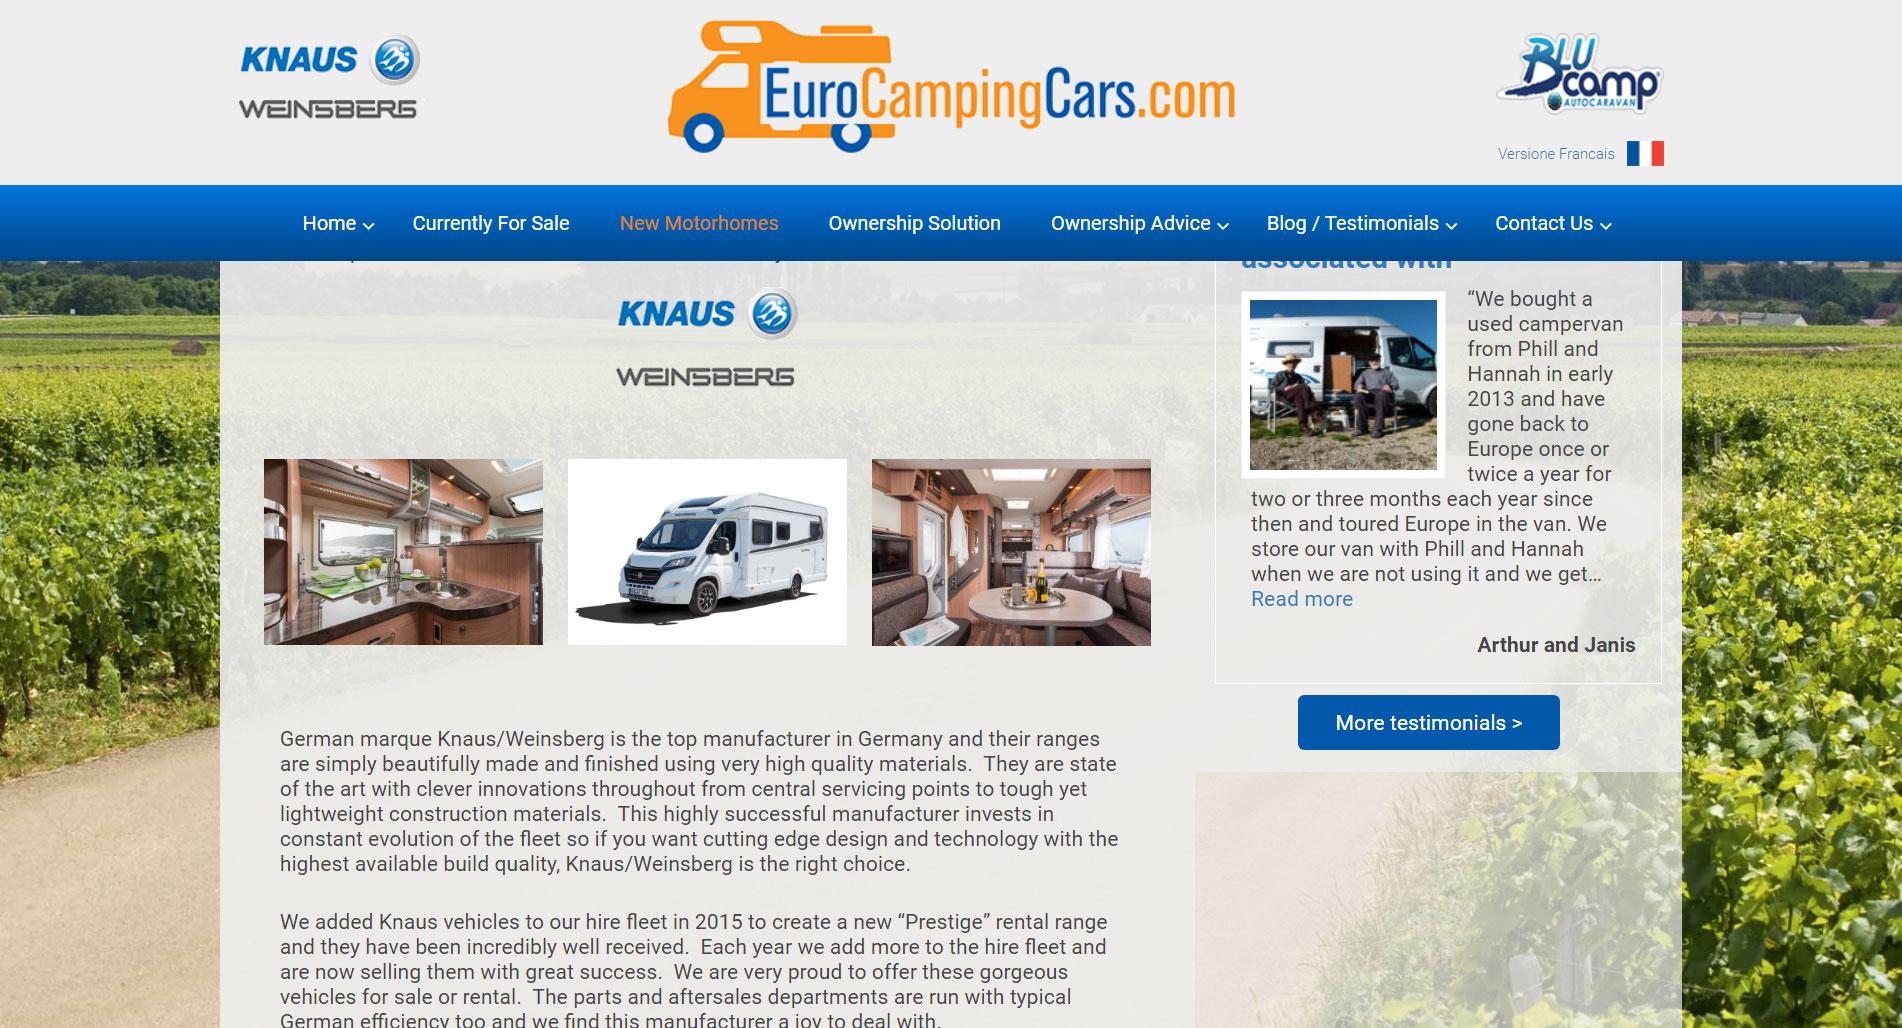 euro camping cars screen shot 3